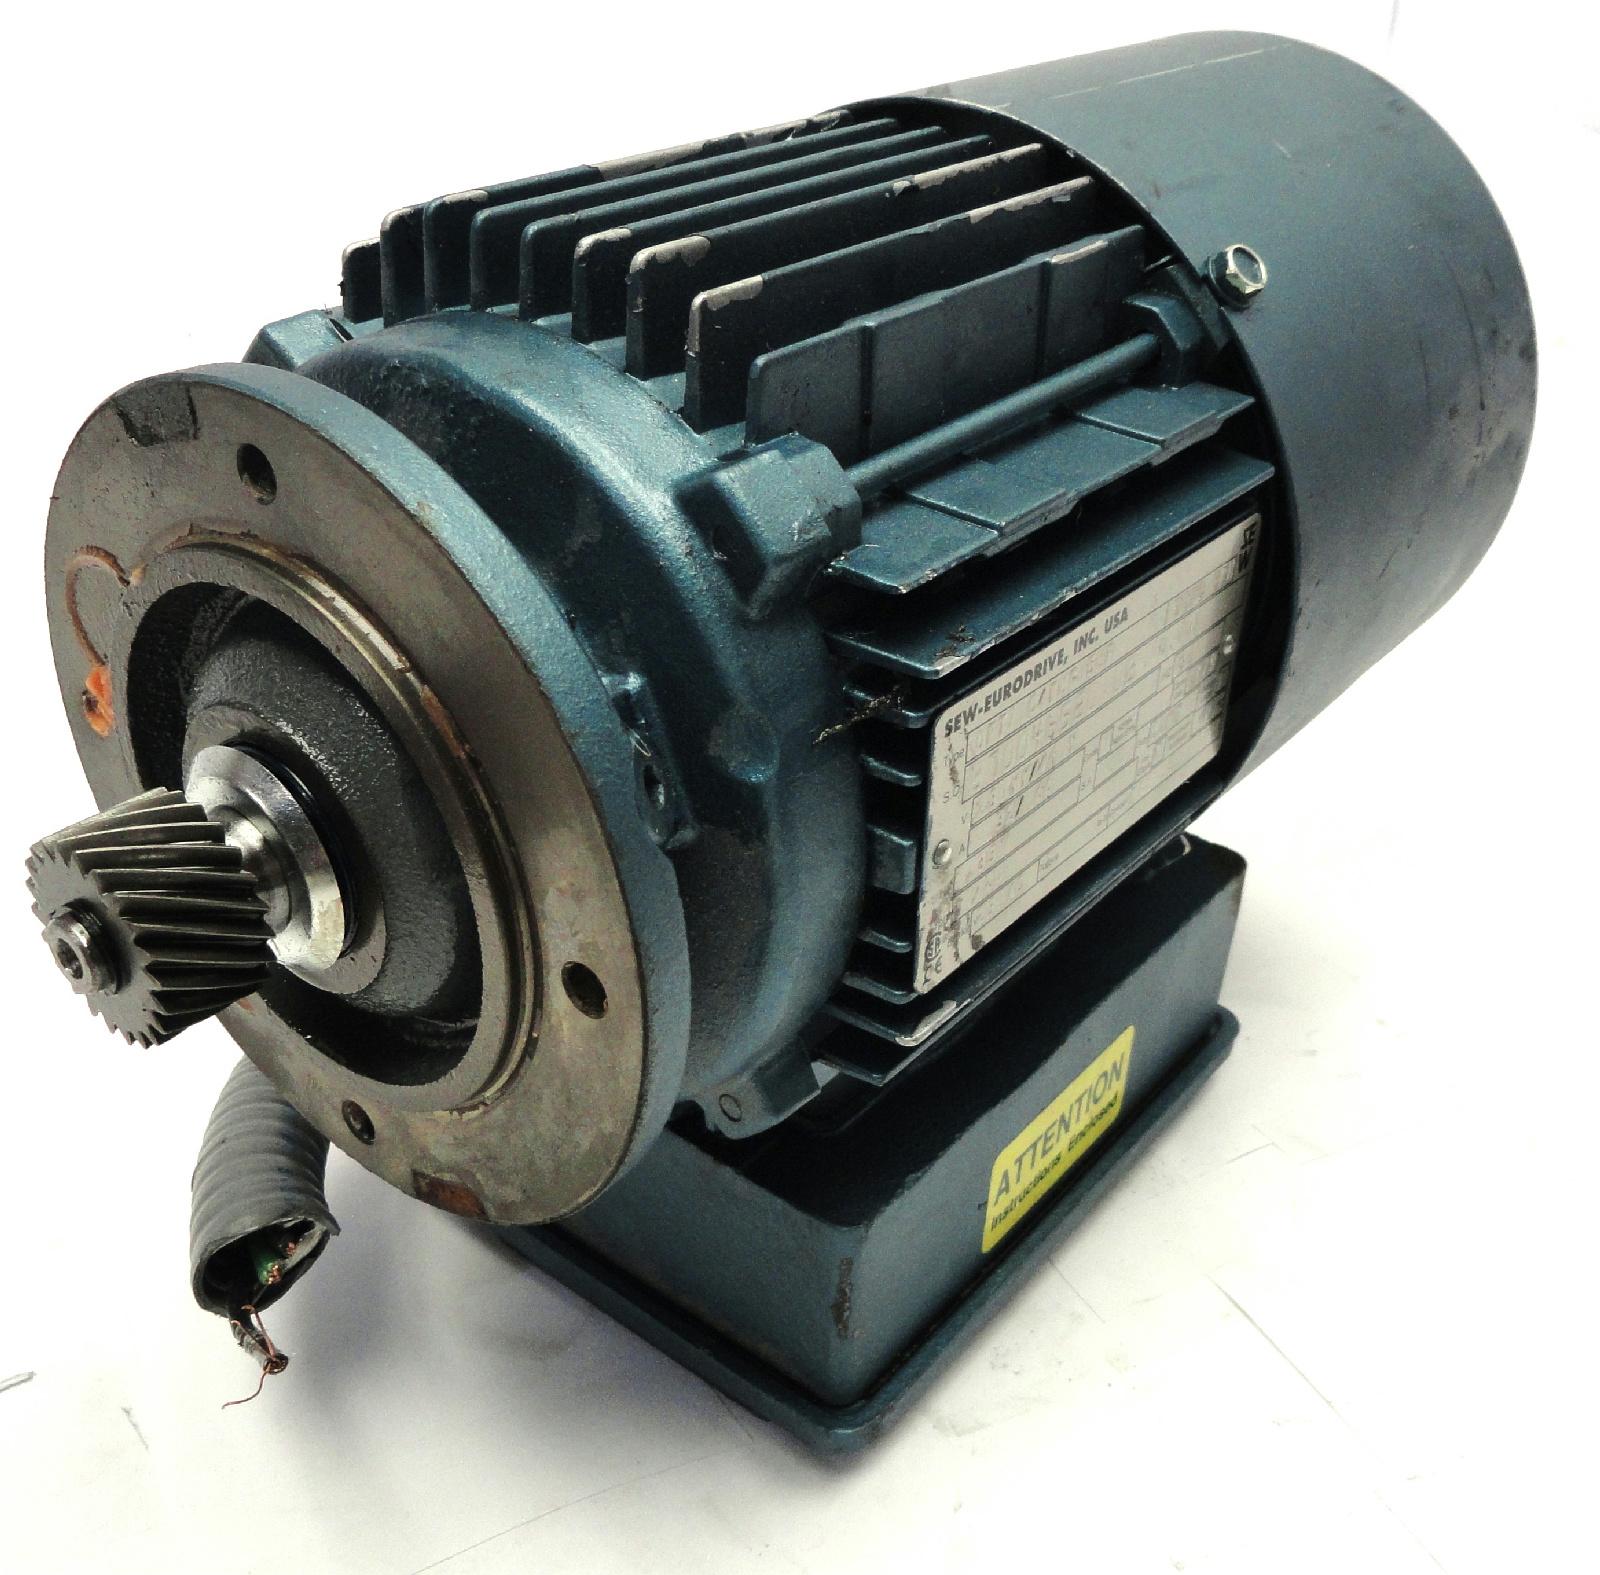 Sew eurodrive dft71c4bmg05hr 1 3hp 230 460v ac 1720rpm for Sew eurodrive gear motor